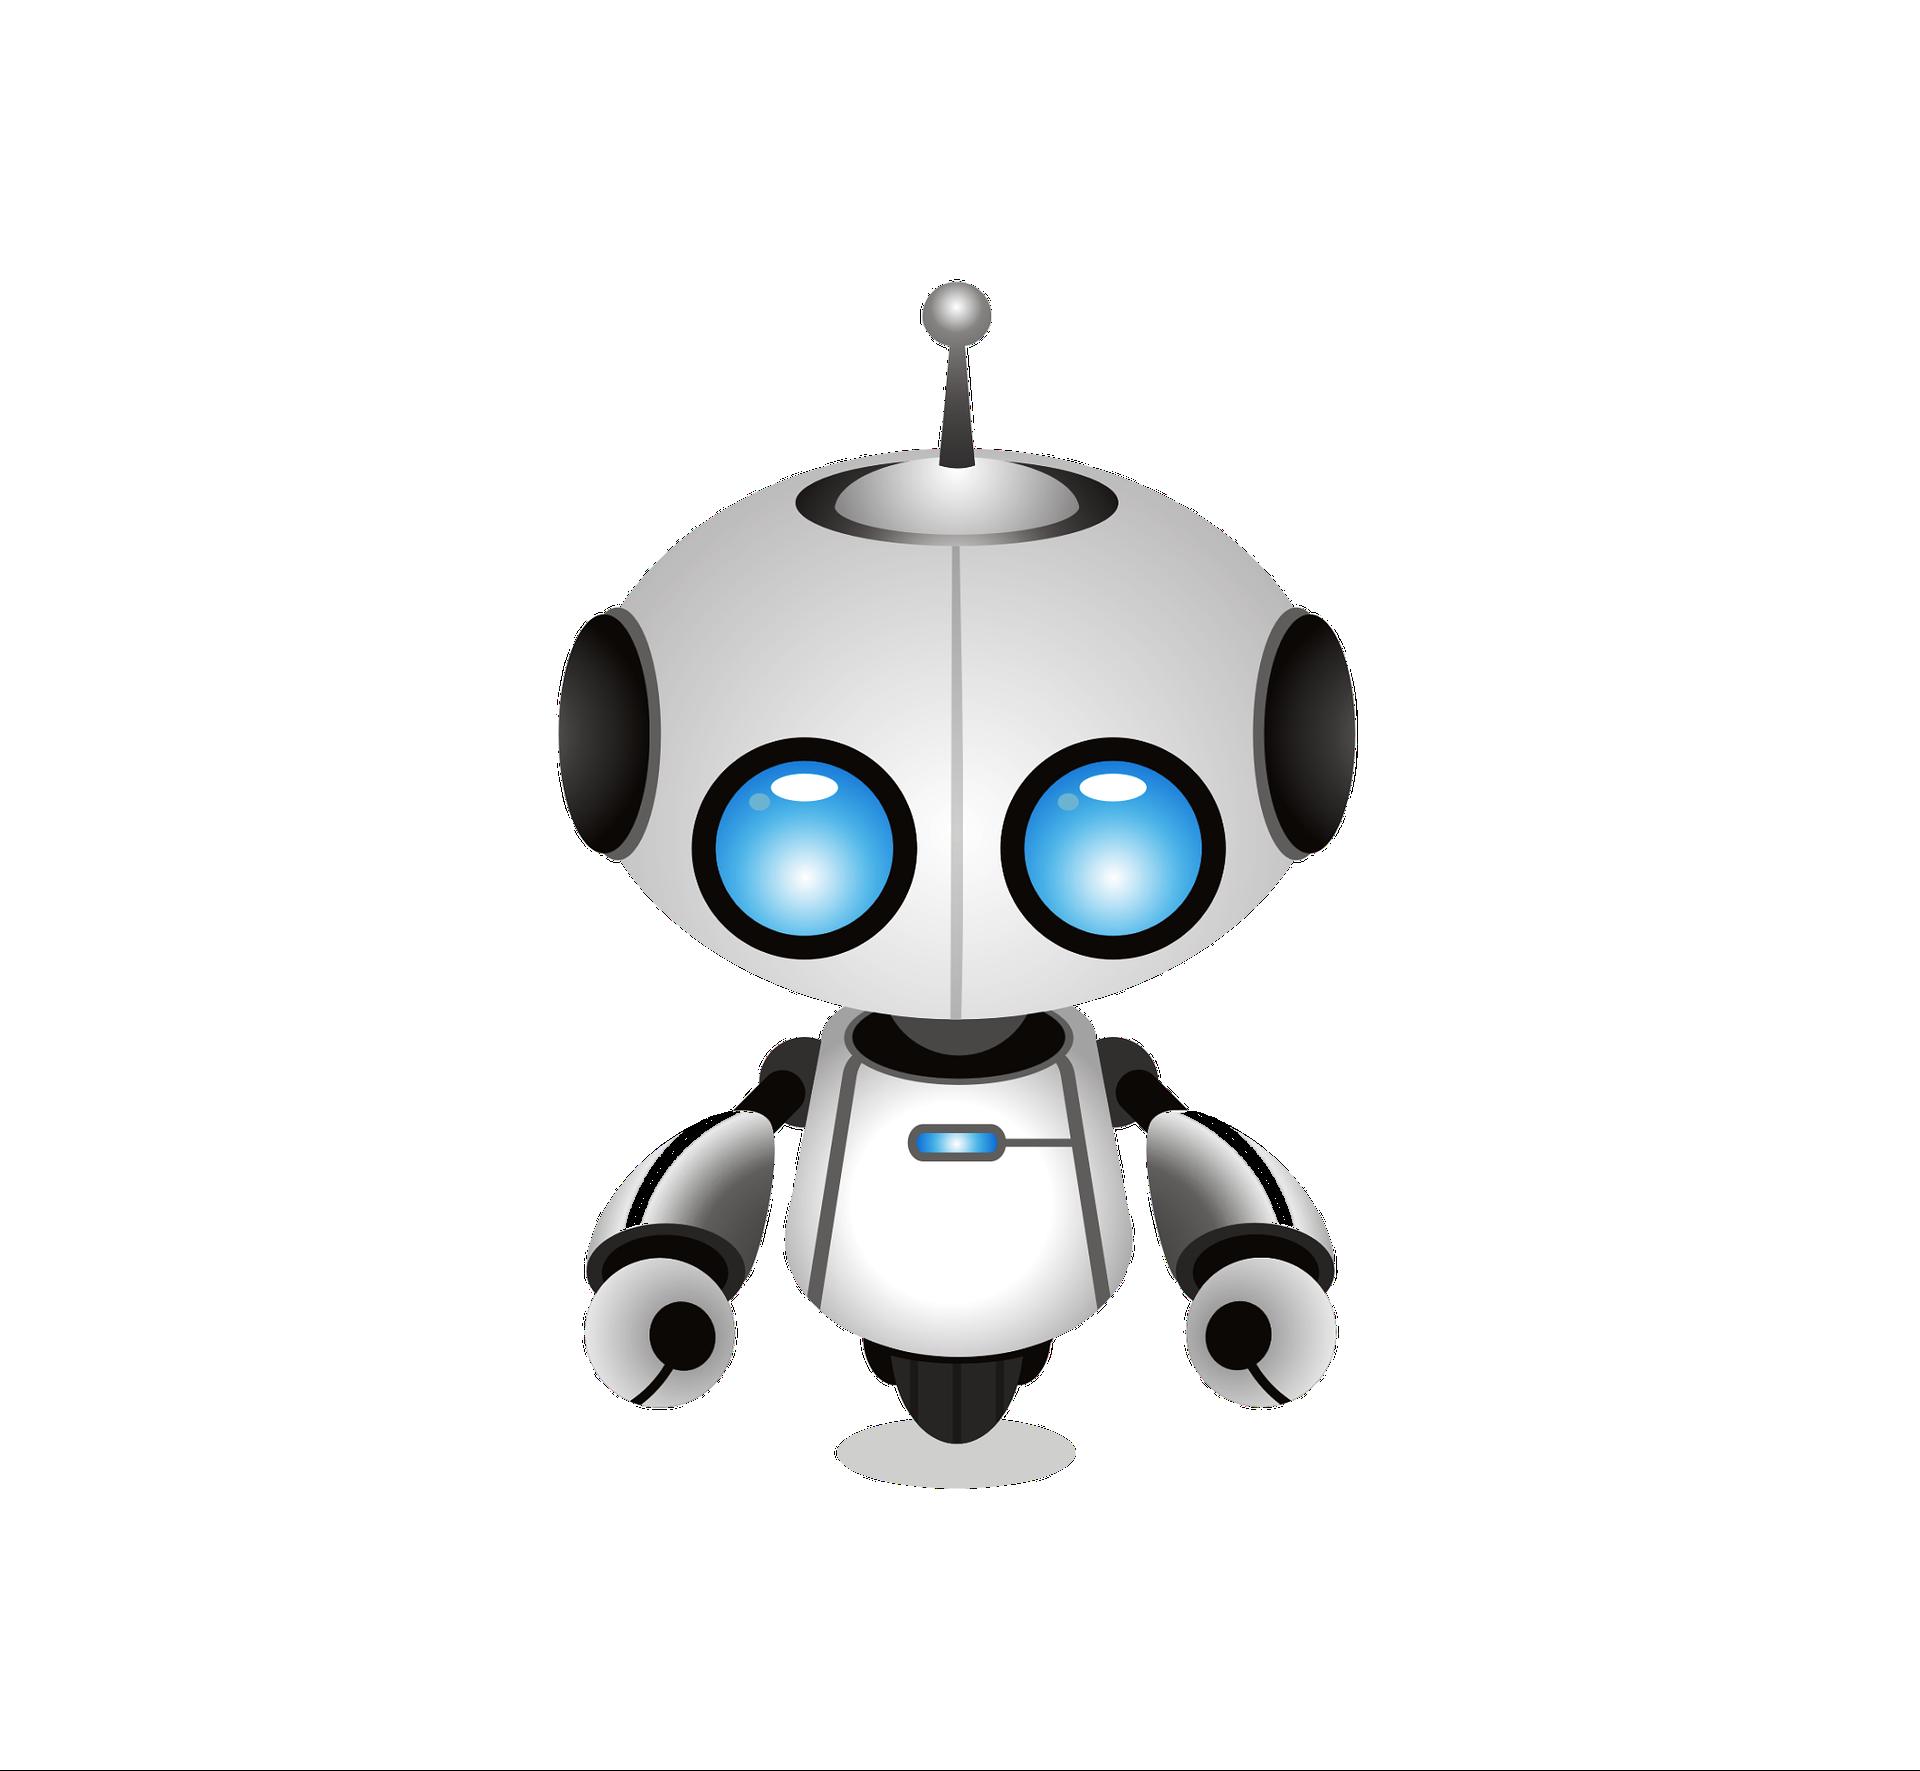 helper-bot-transparent-bg.png